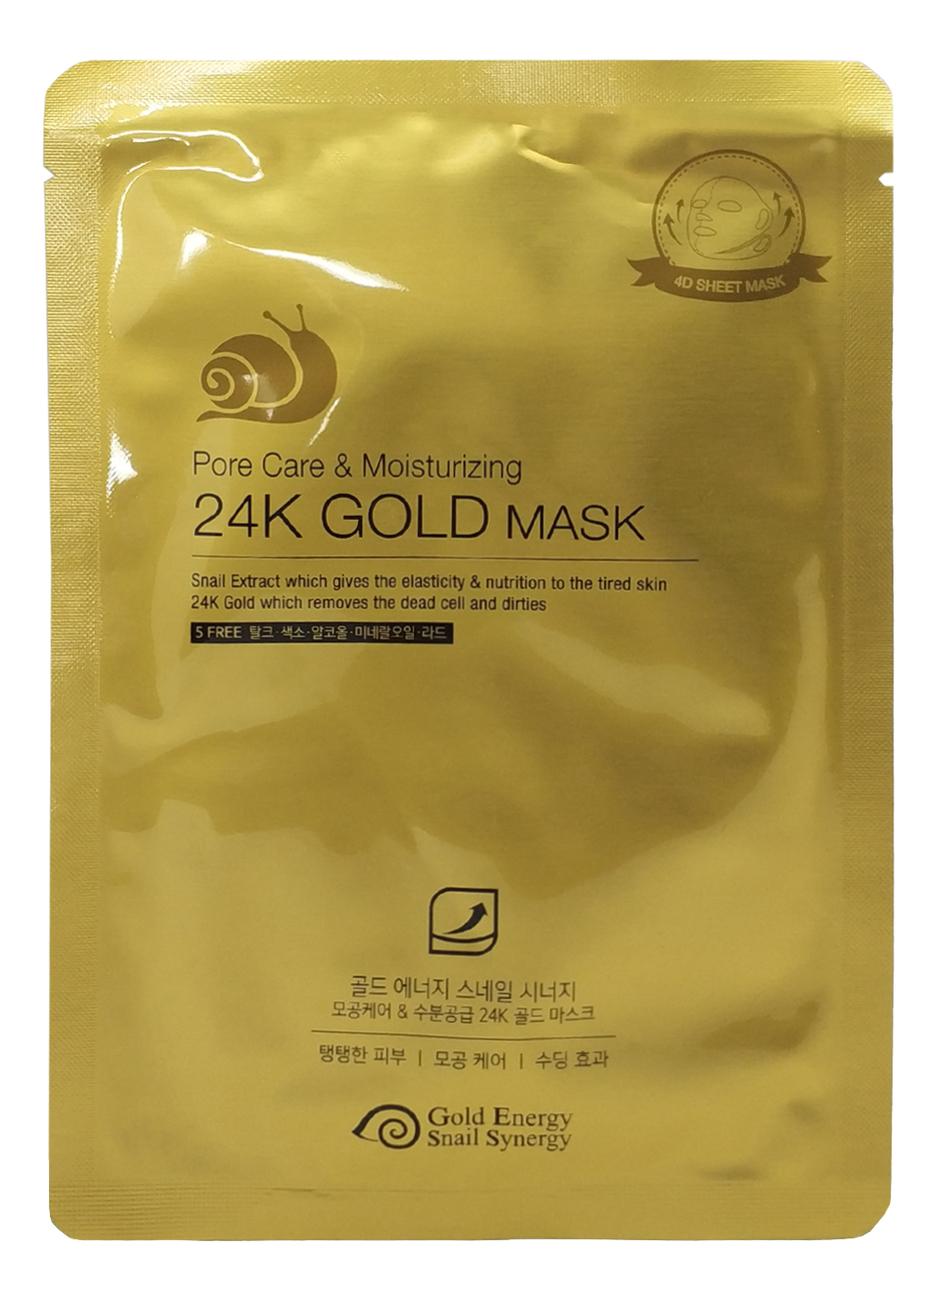 Маска для лица увлажняющая Pore Care & Moisturizing 24K Gold Mask: 1шт